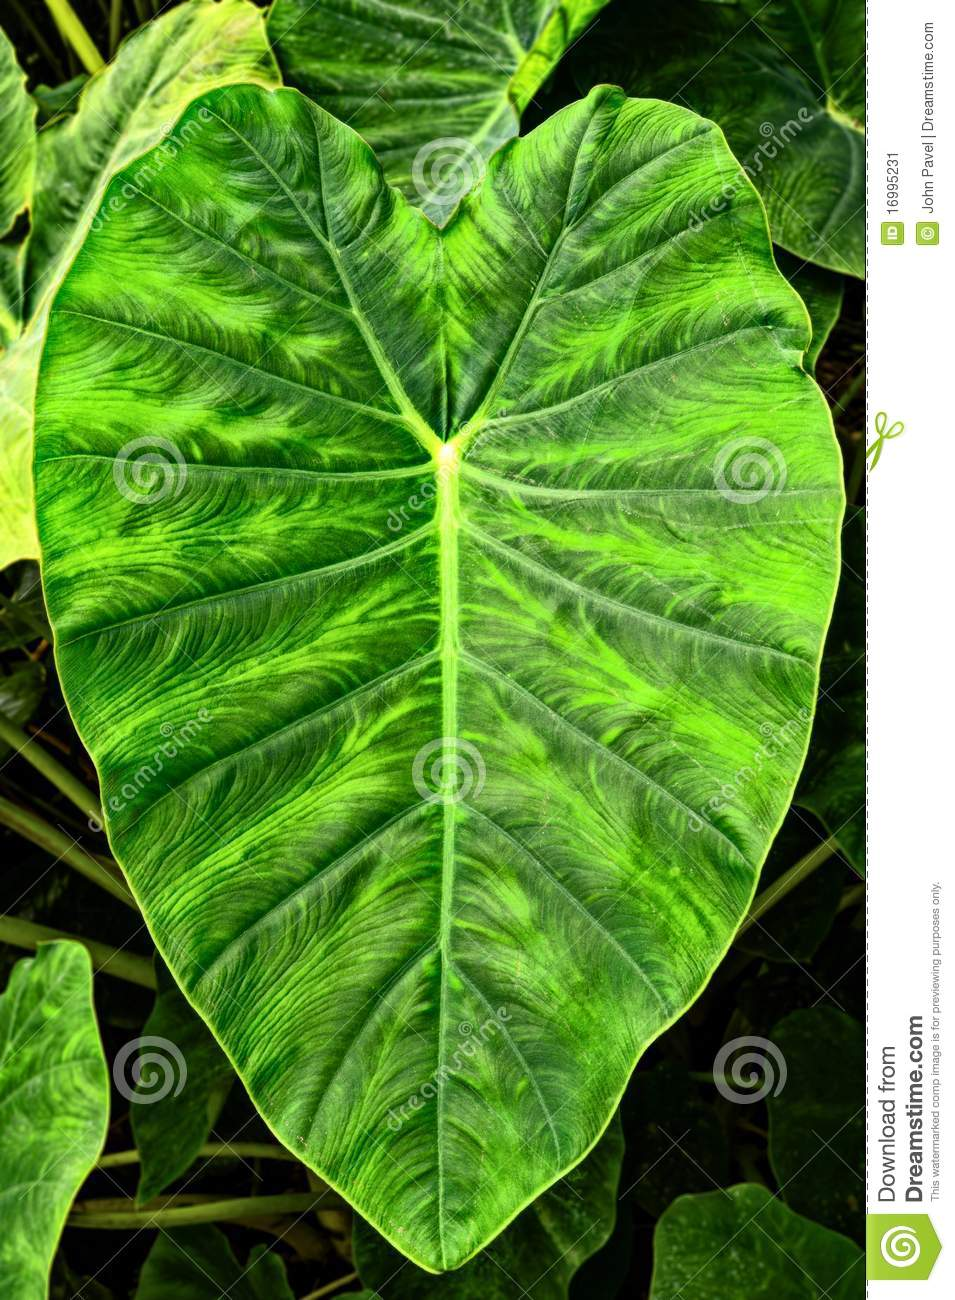 Giant Elephant Ear Taro Leaf,Alocasia Macrorrhizos Stock Image.